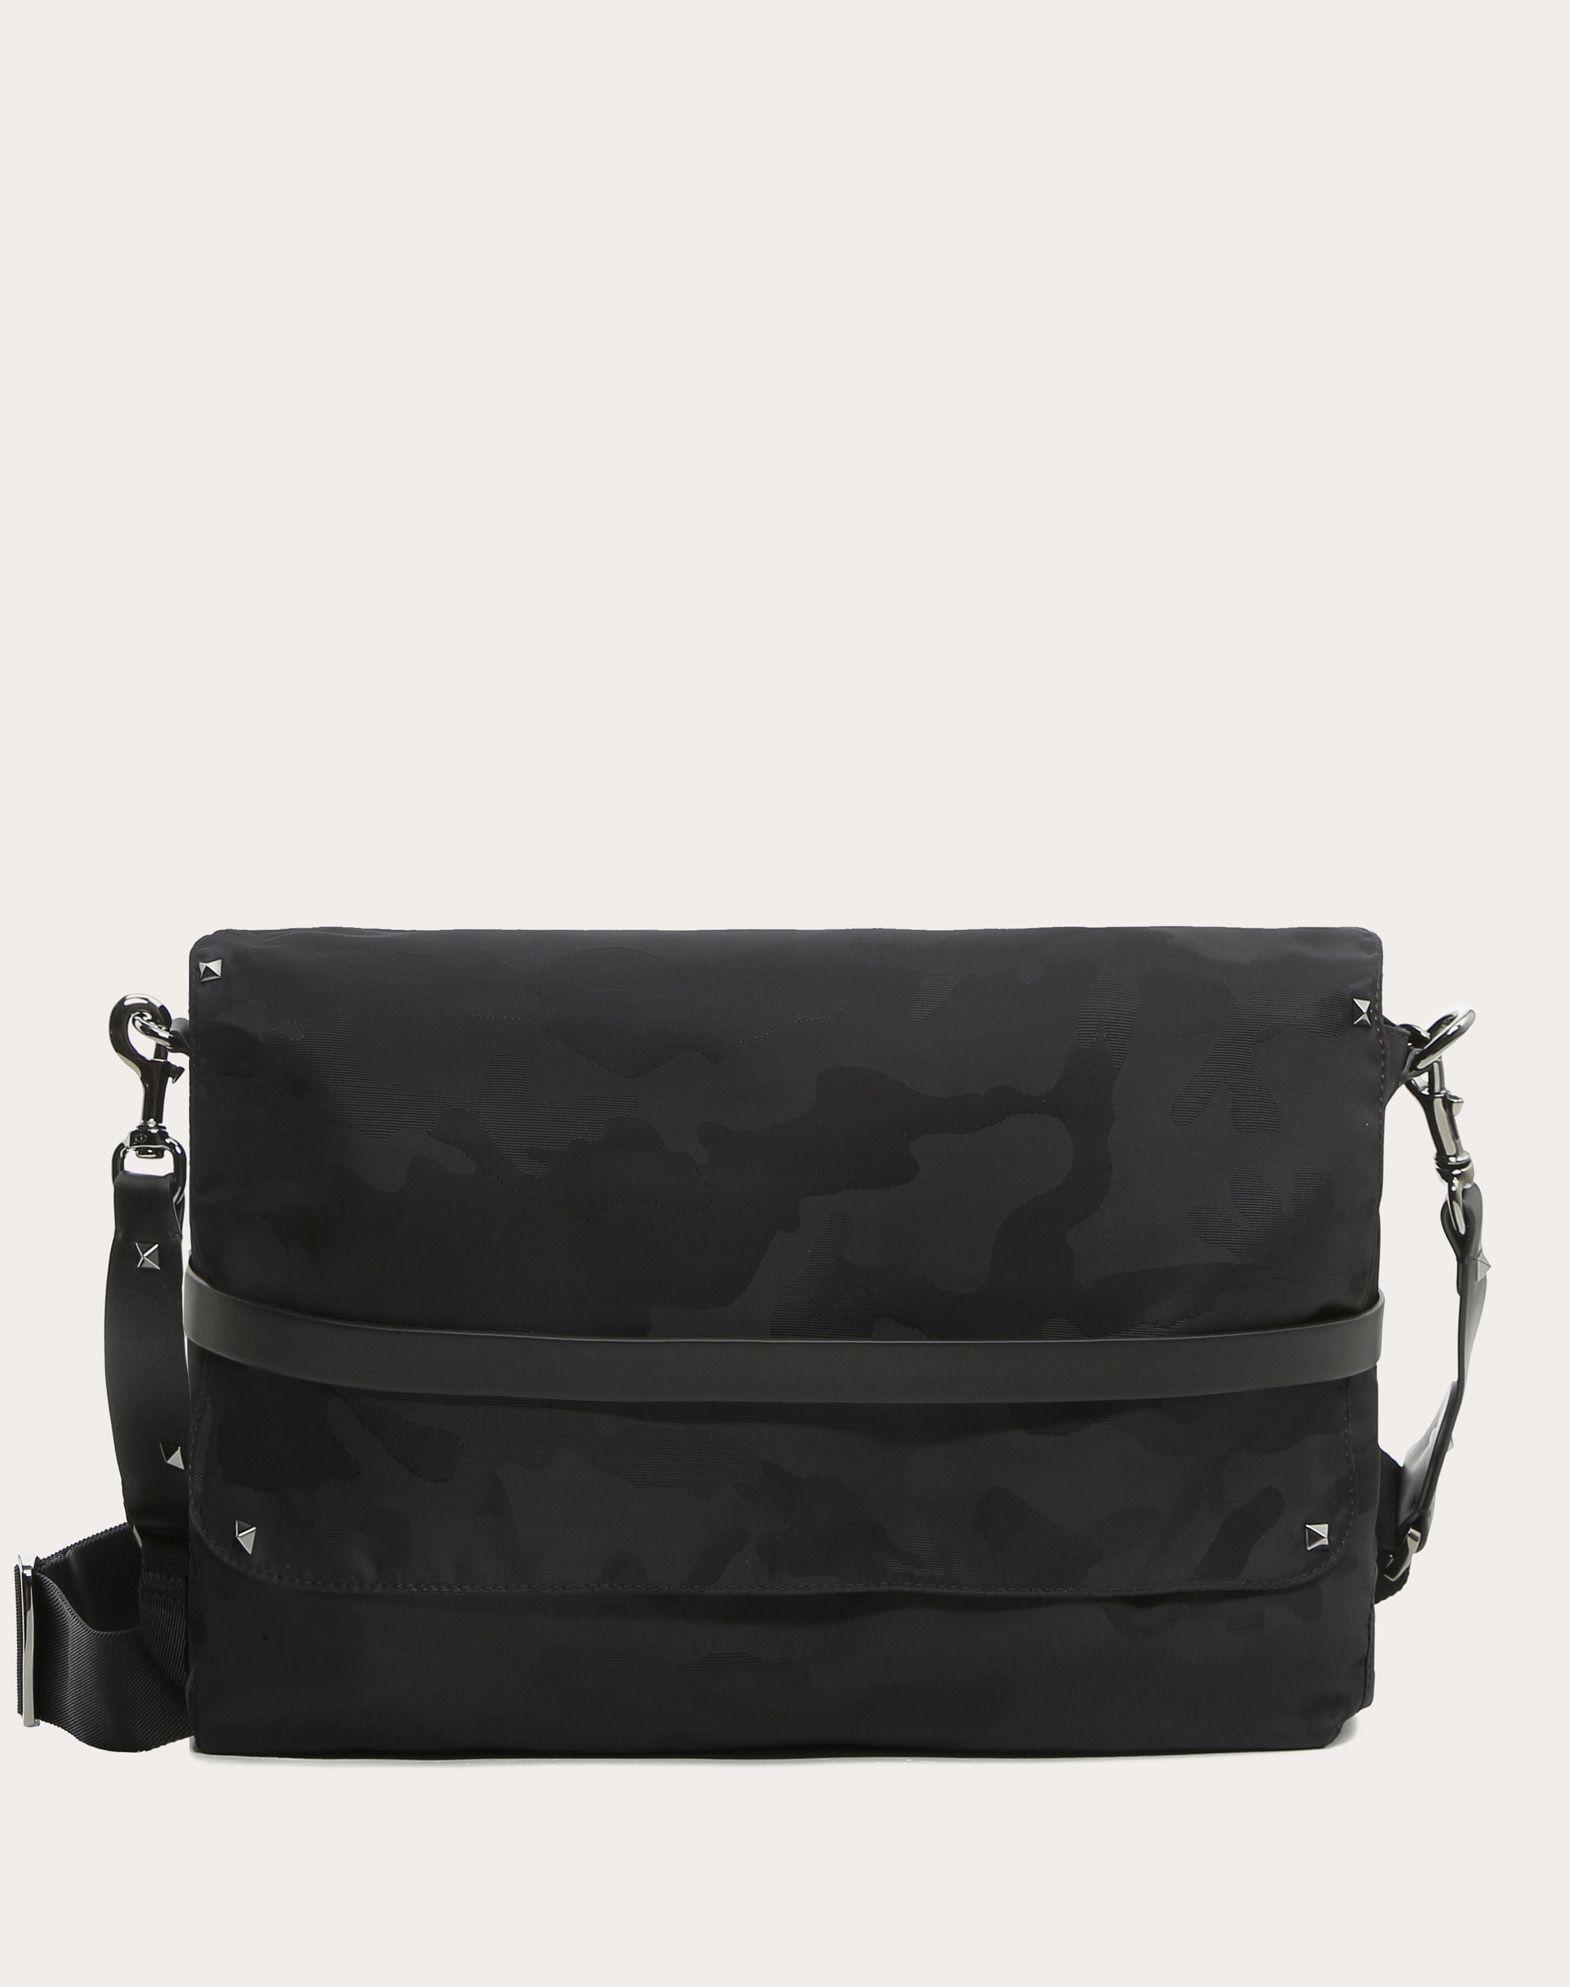 VALENTINO Jacquard Techno fabric Logo Studs Internal pockets Removable shoulder strap  45359563xu